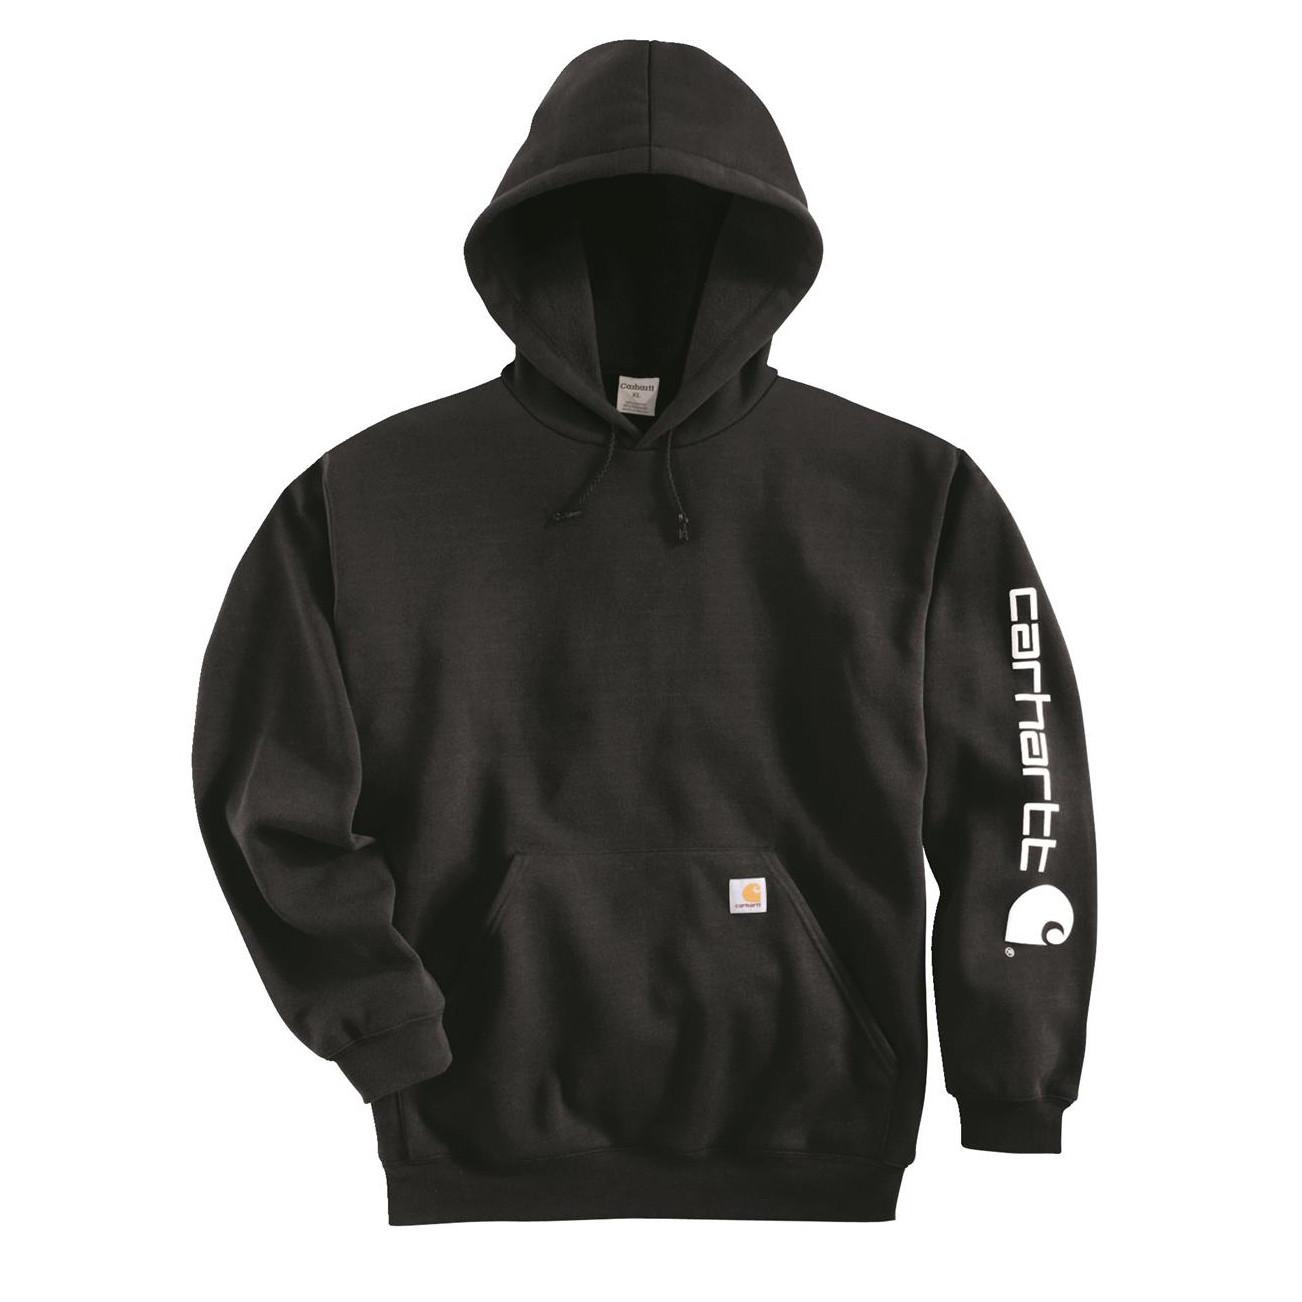 Худи Carhartt Sleeve Logo Hooded Sweatshirt - K288 (Dark Brown, XL)